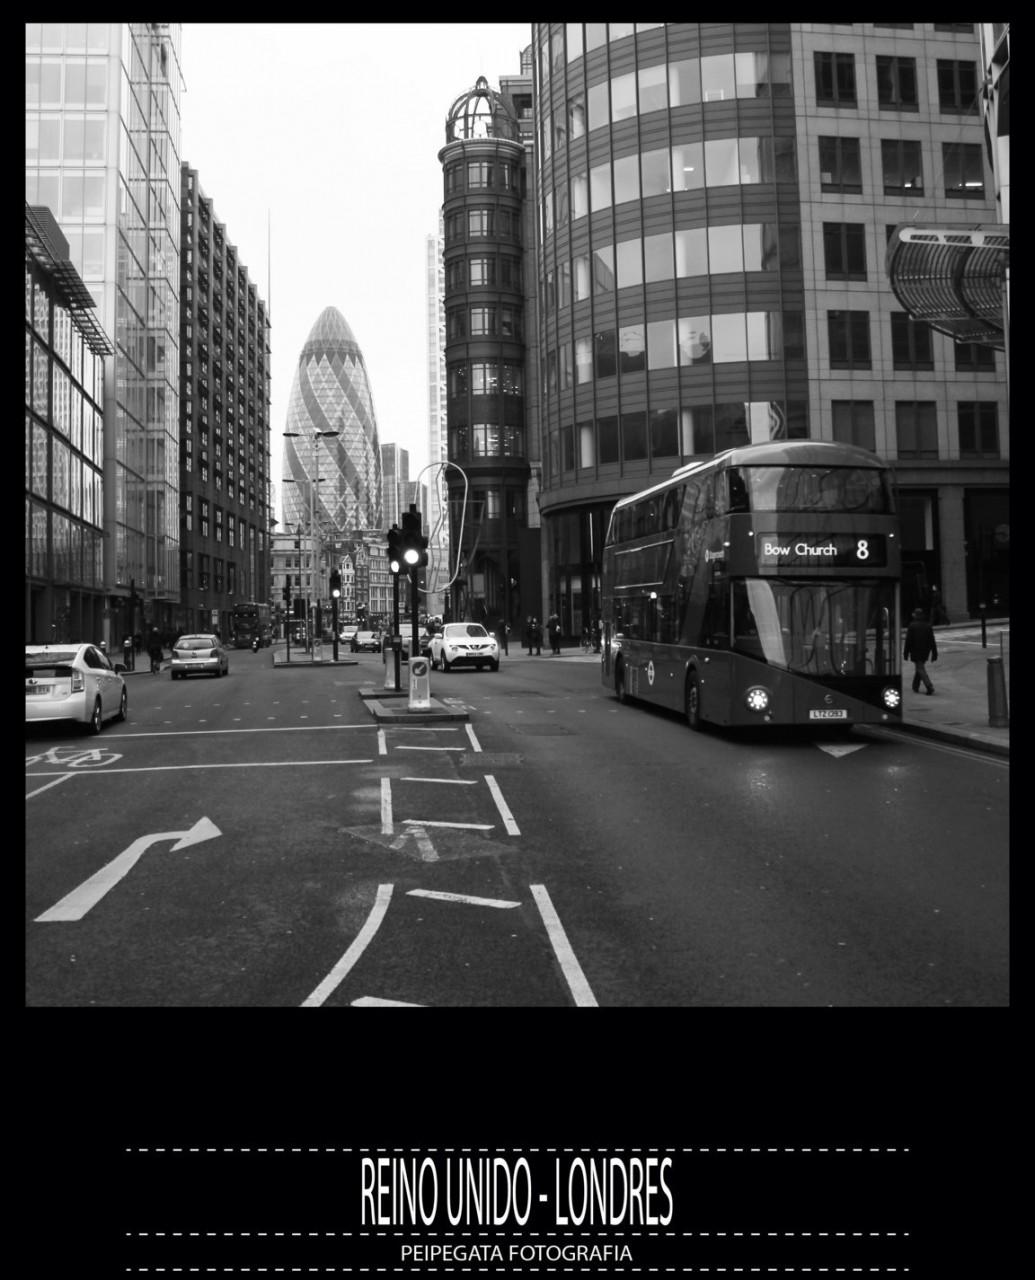 peipegata londres london viajes fotografia peipegatafotografia